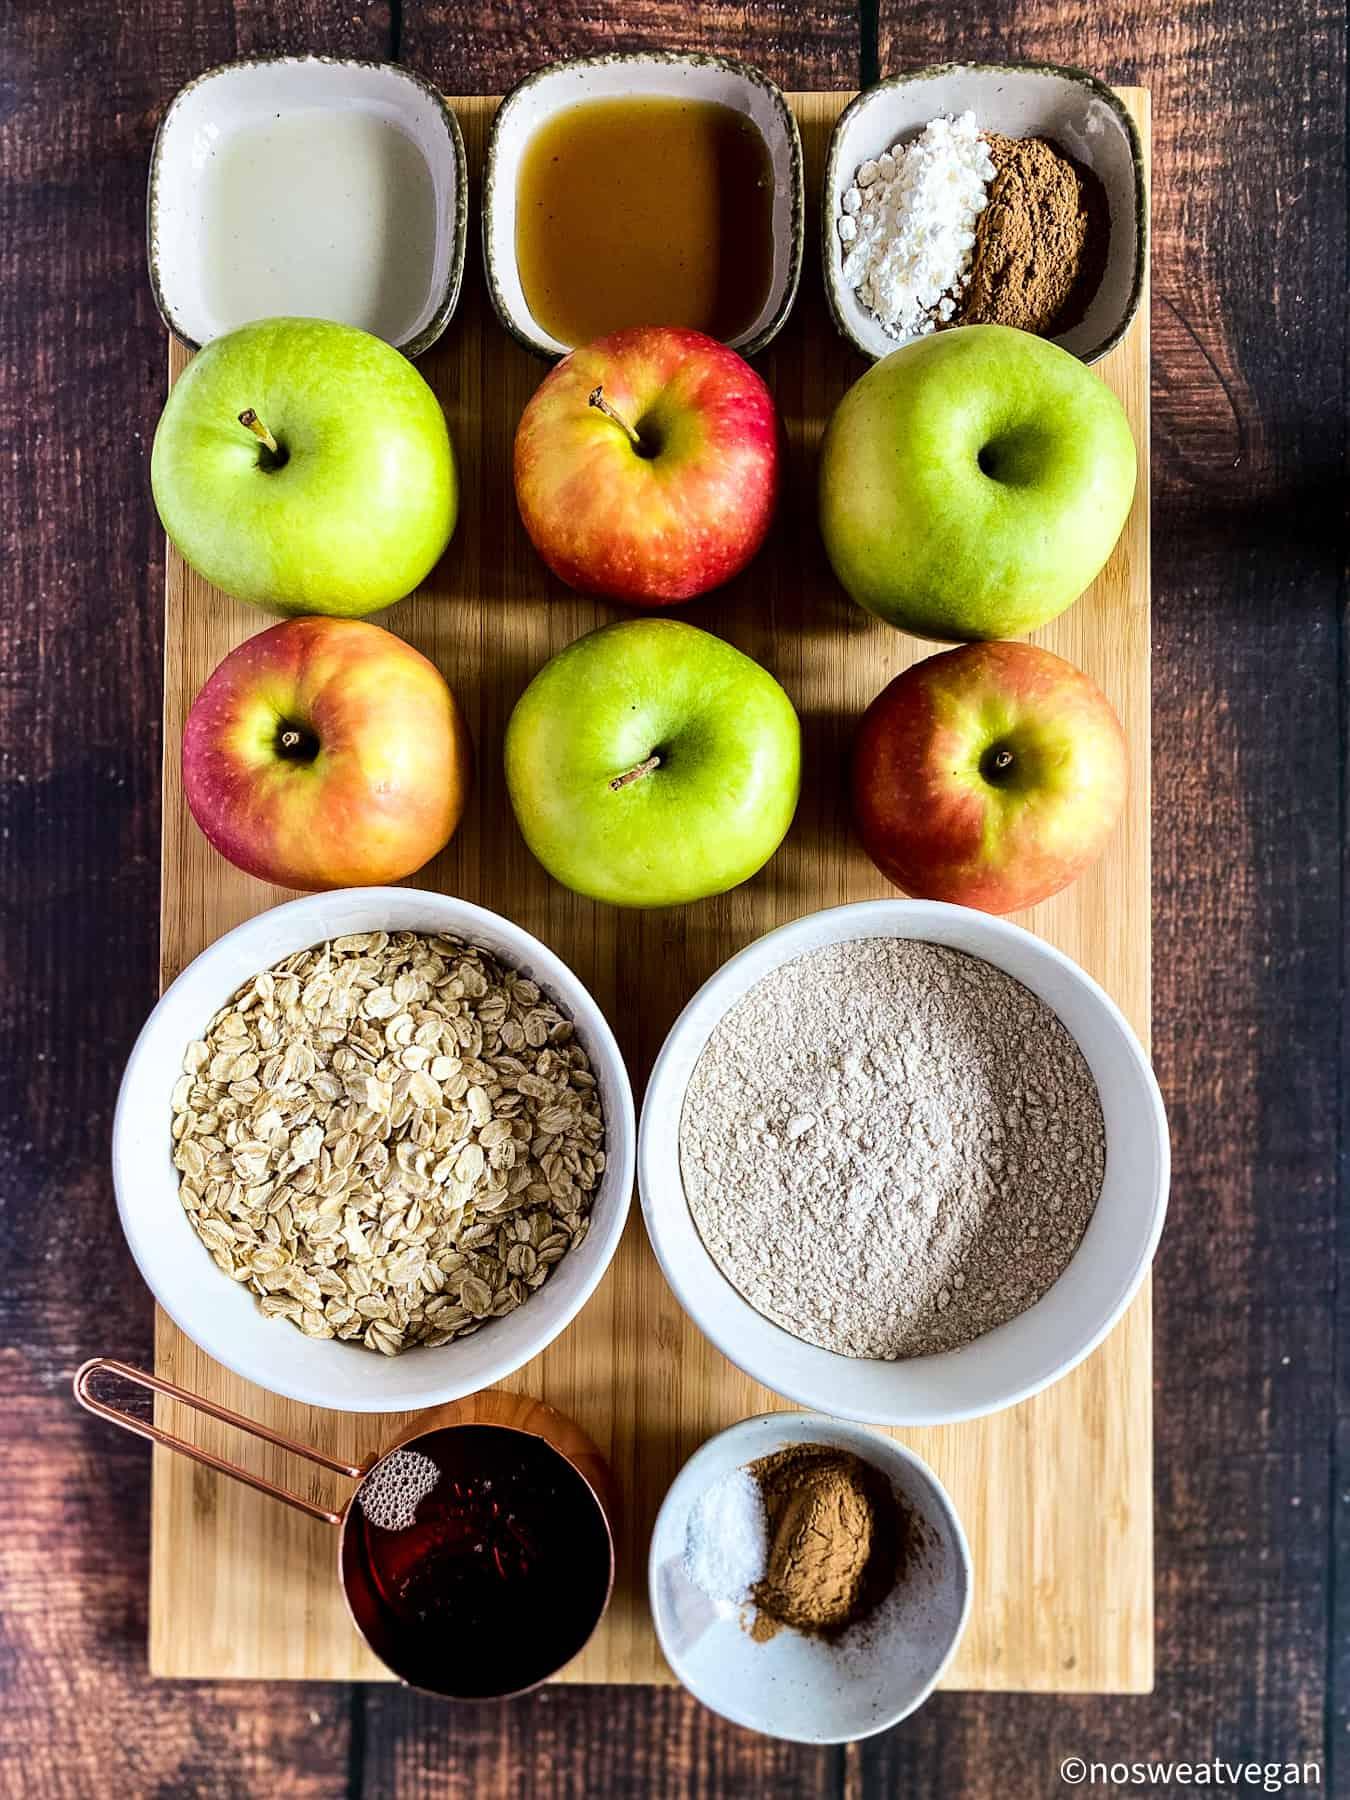 Ingredients for vegan apple crisp.